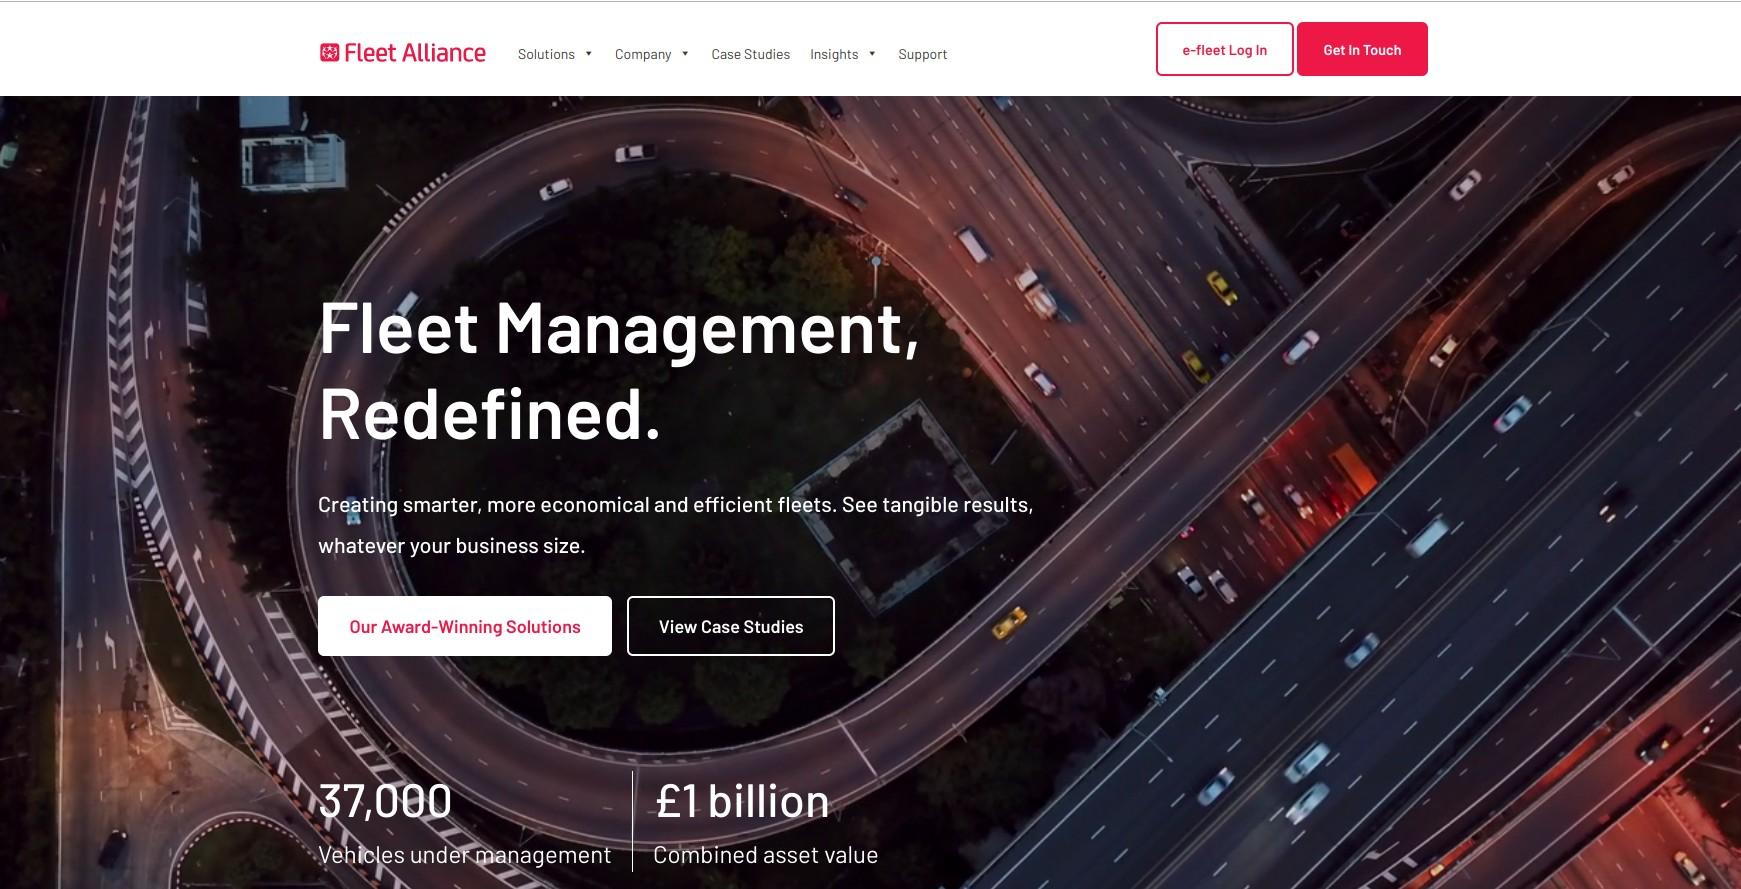 New Fleet Alliance website